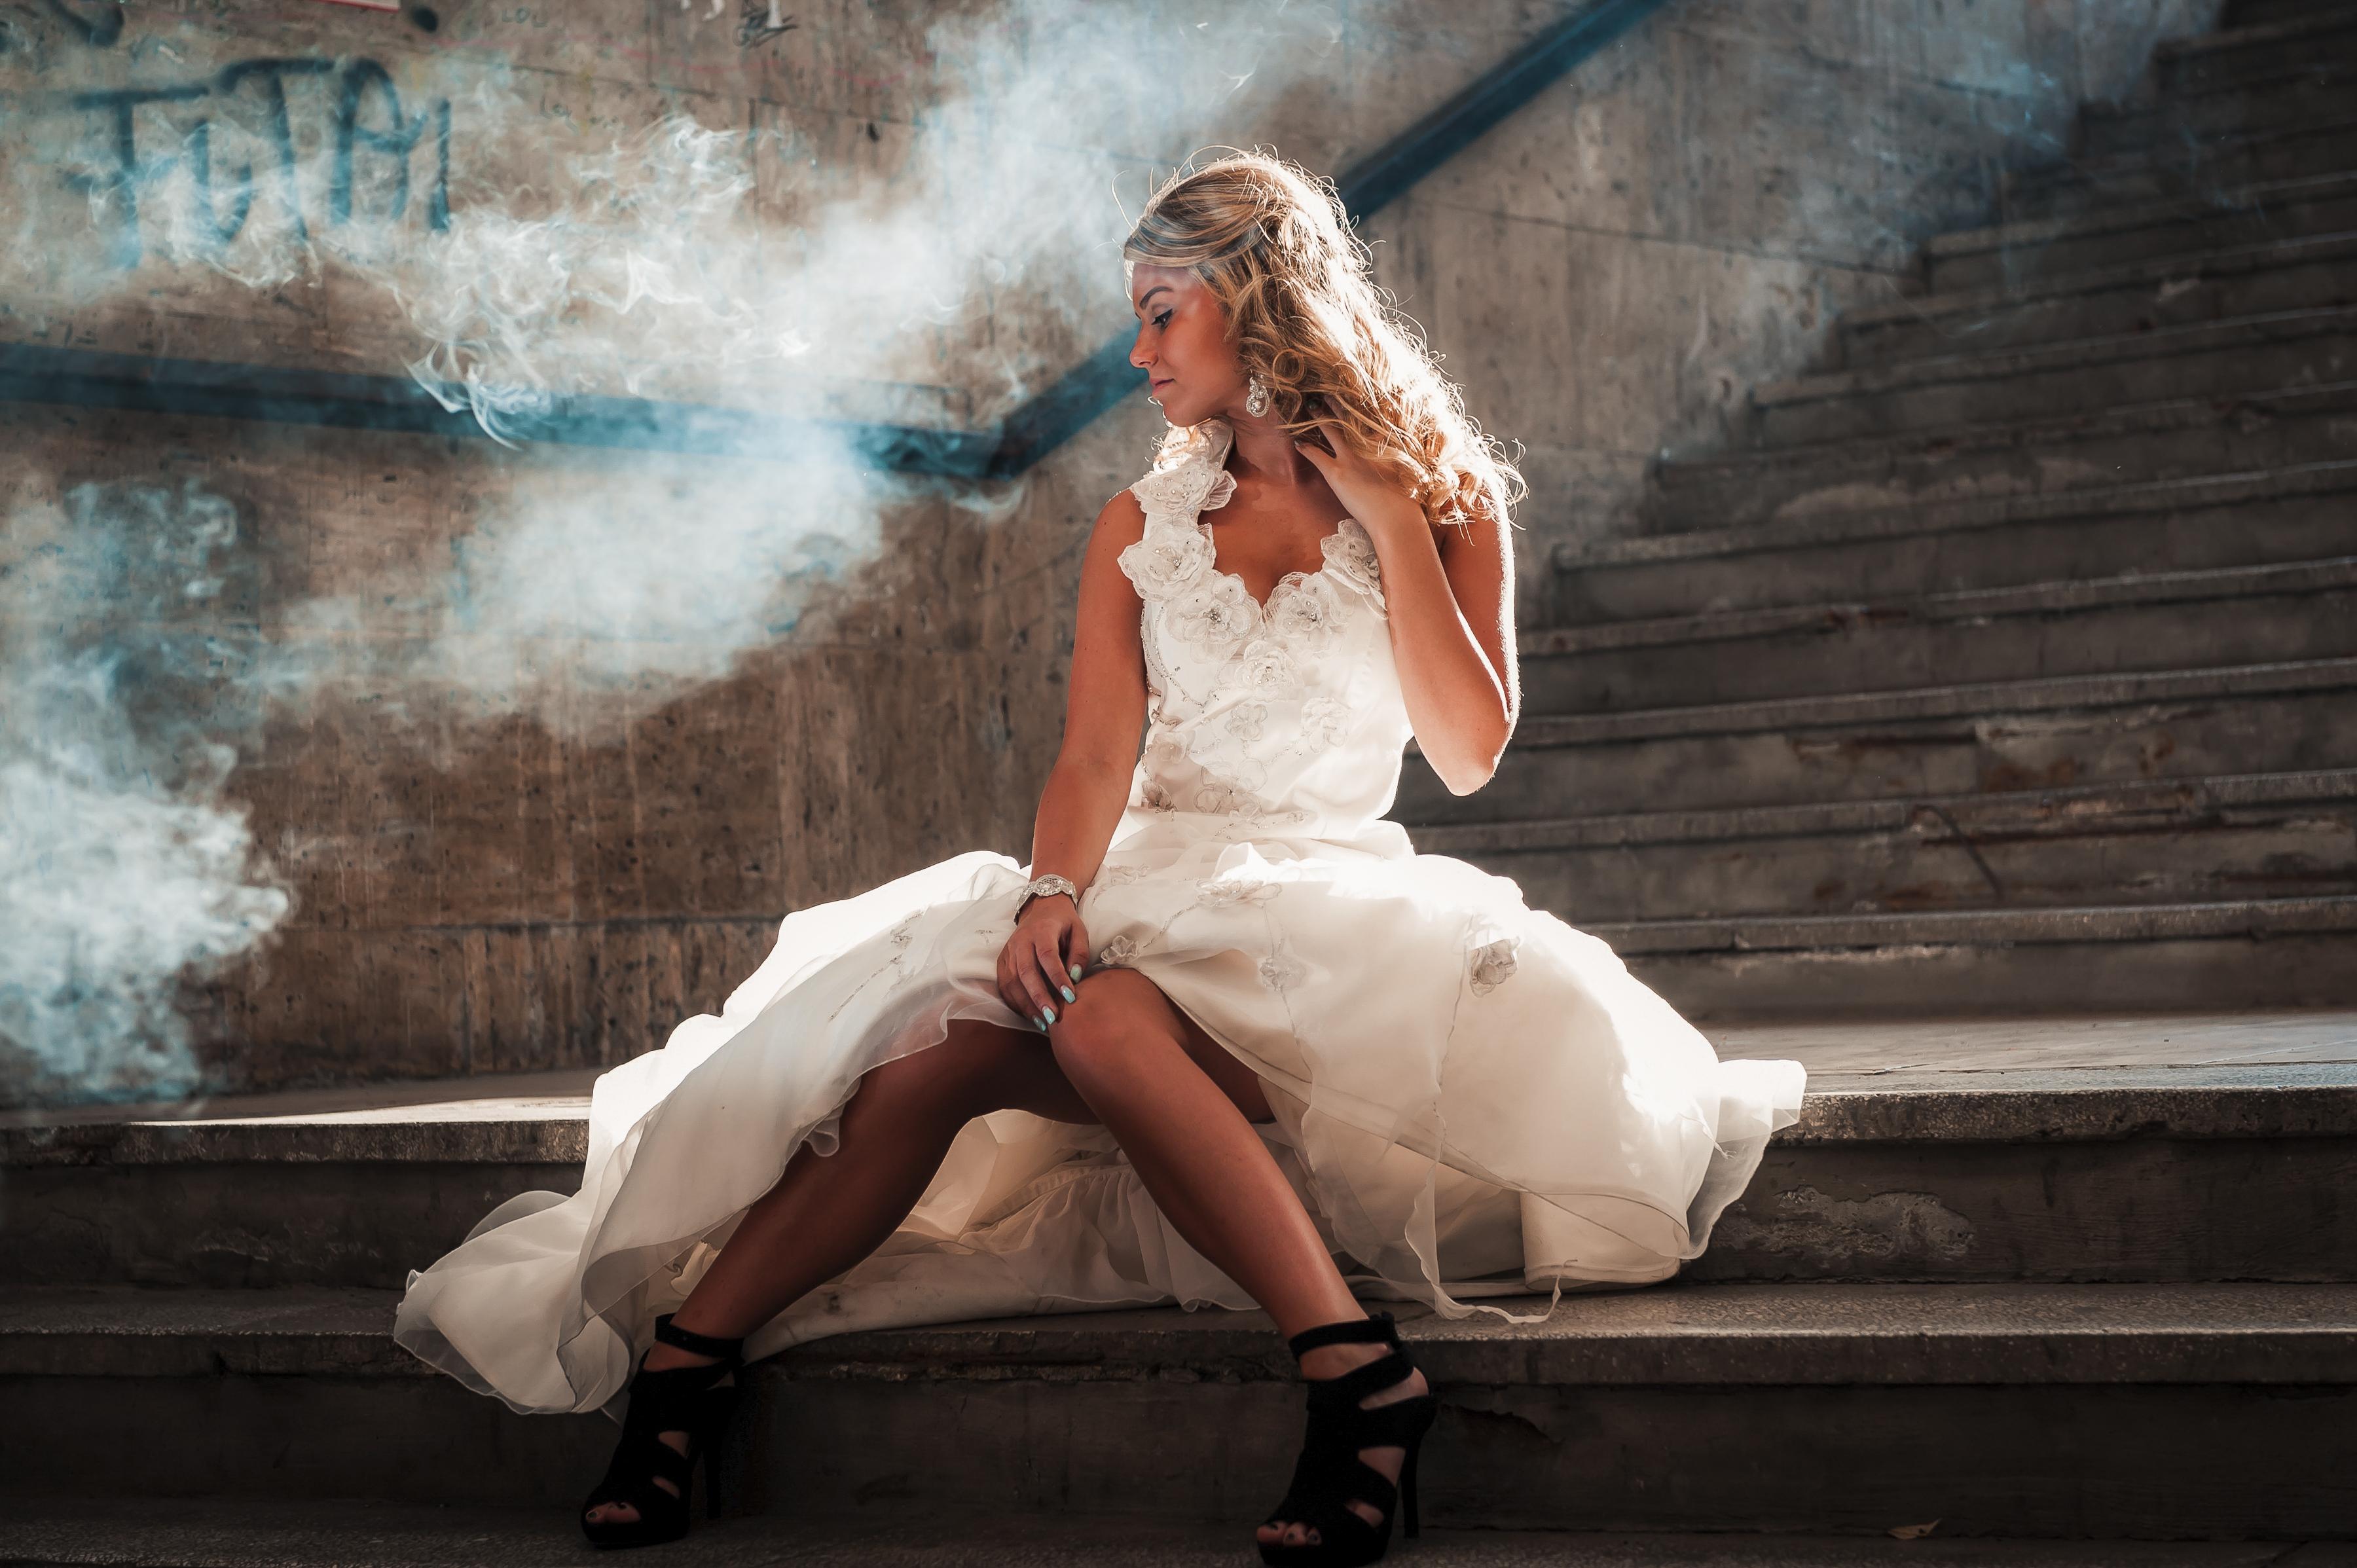 https://sleeklens.com/wp-content/uploads/2018/09/wedding-lightroom-presets-signature-bride-groom-after-10.jpg